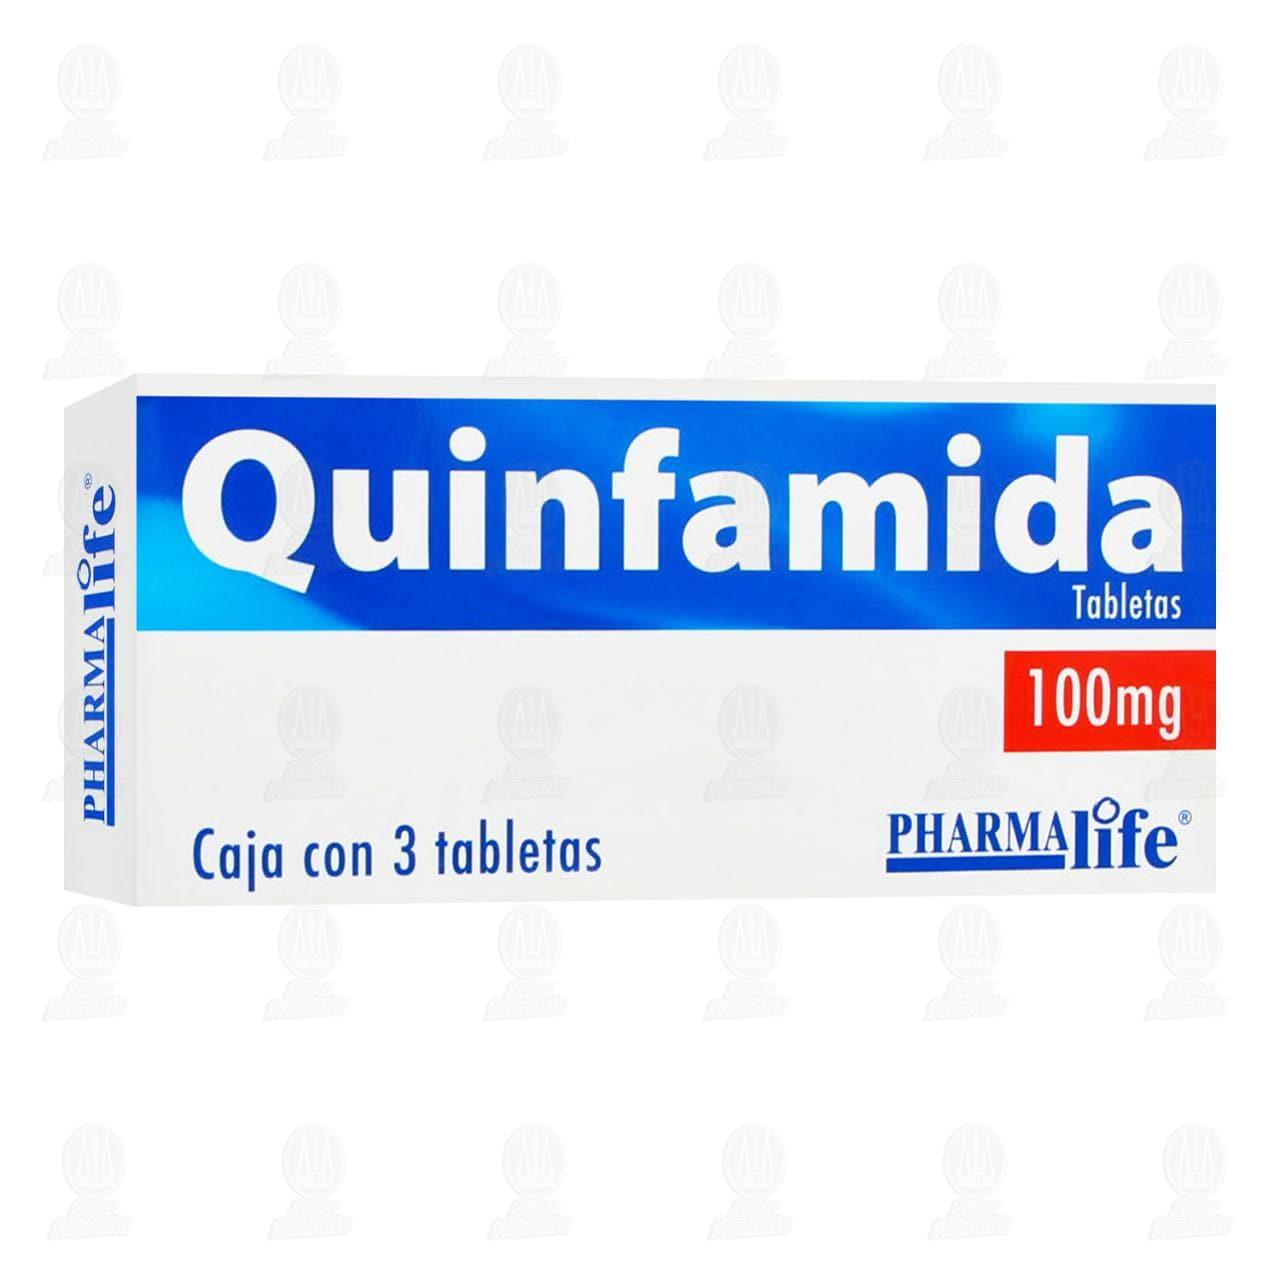 Comprar Quinfamida 100mg 3 Tabletas Pharmalife en Farmacias Guadalajara